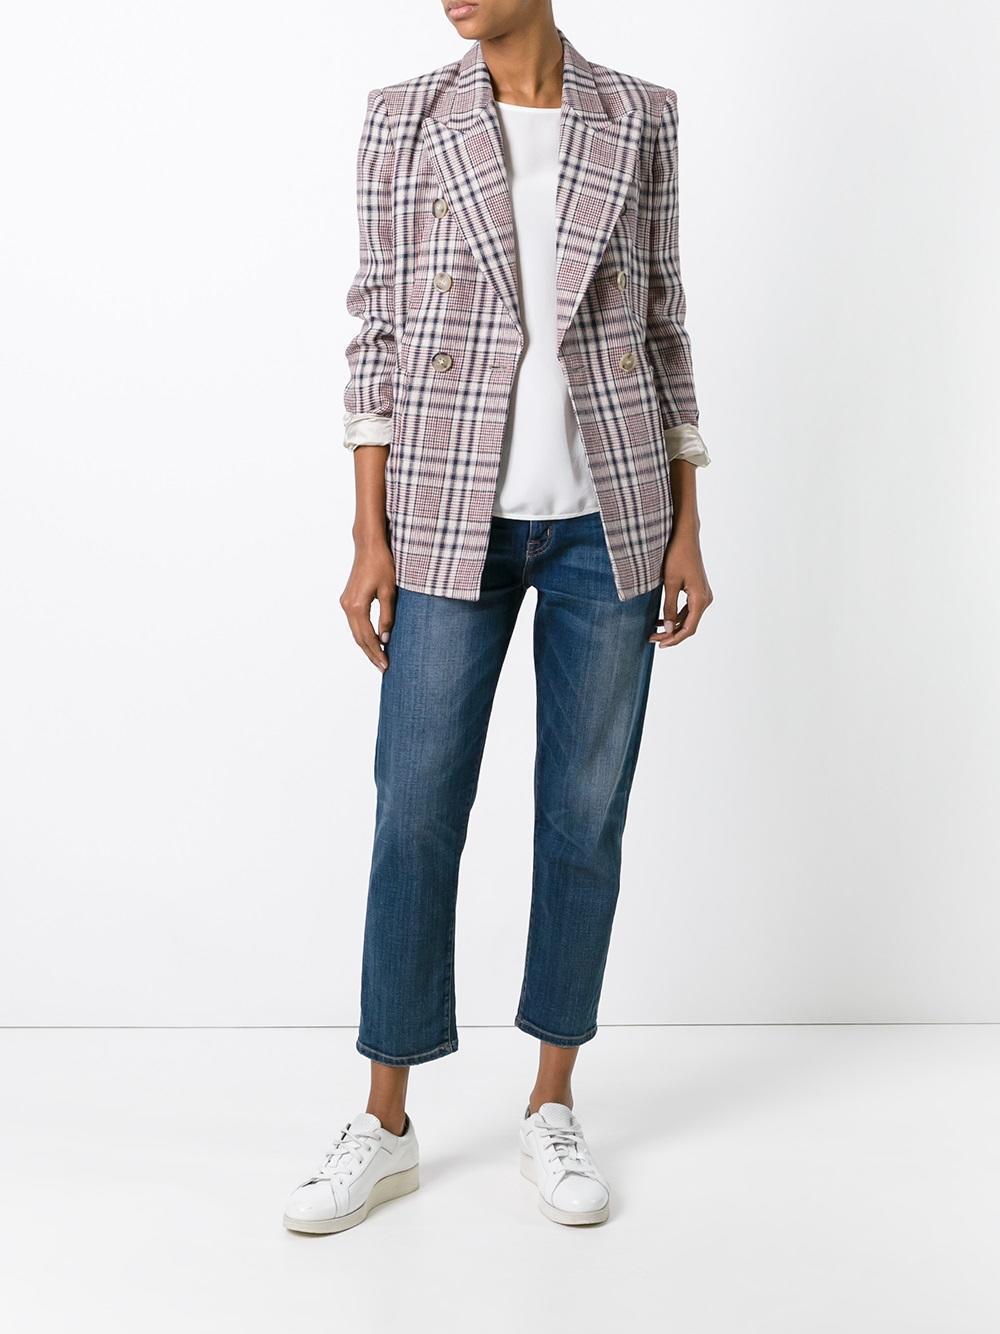 lyst toile isabel marant janey checked linen blazer in natural. Black Bedroom Furniture Sets. Home Design Ideas